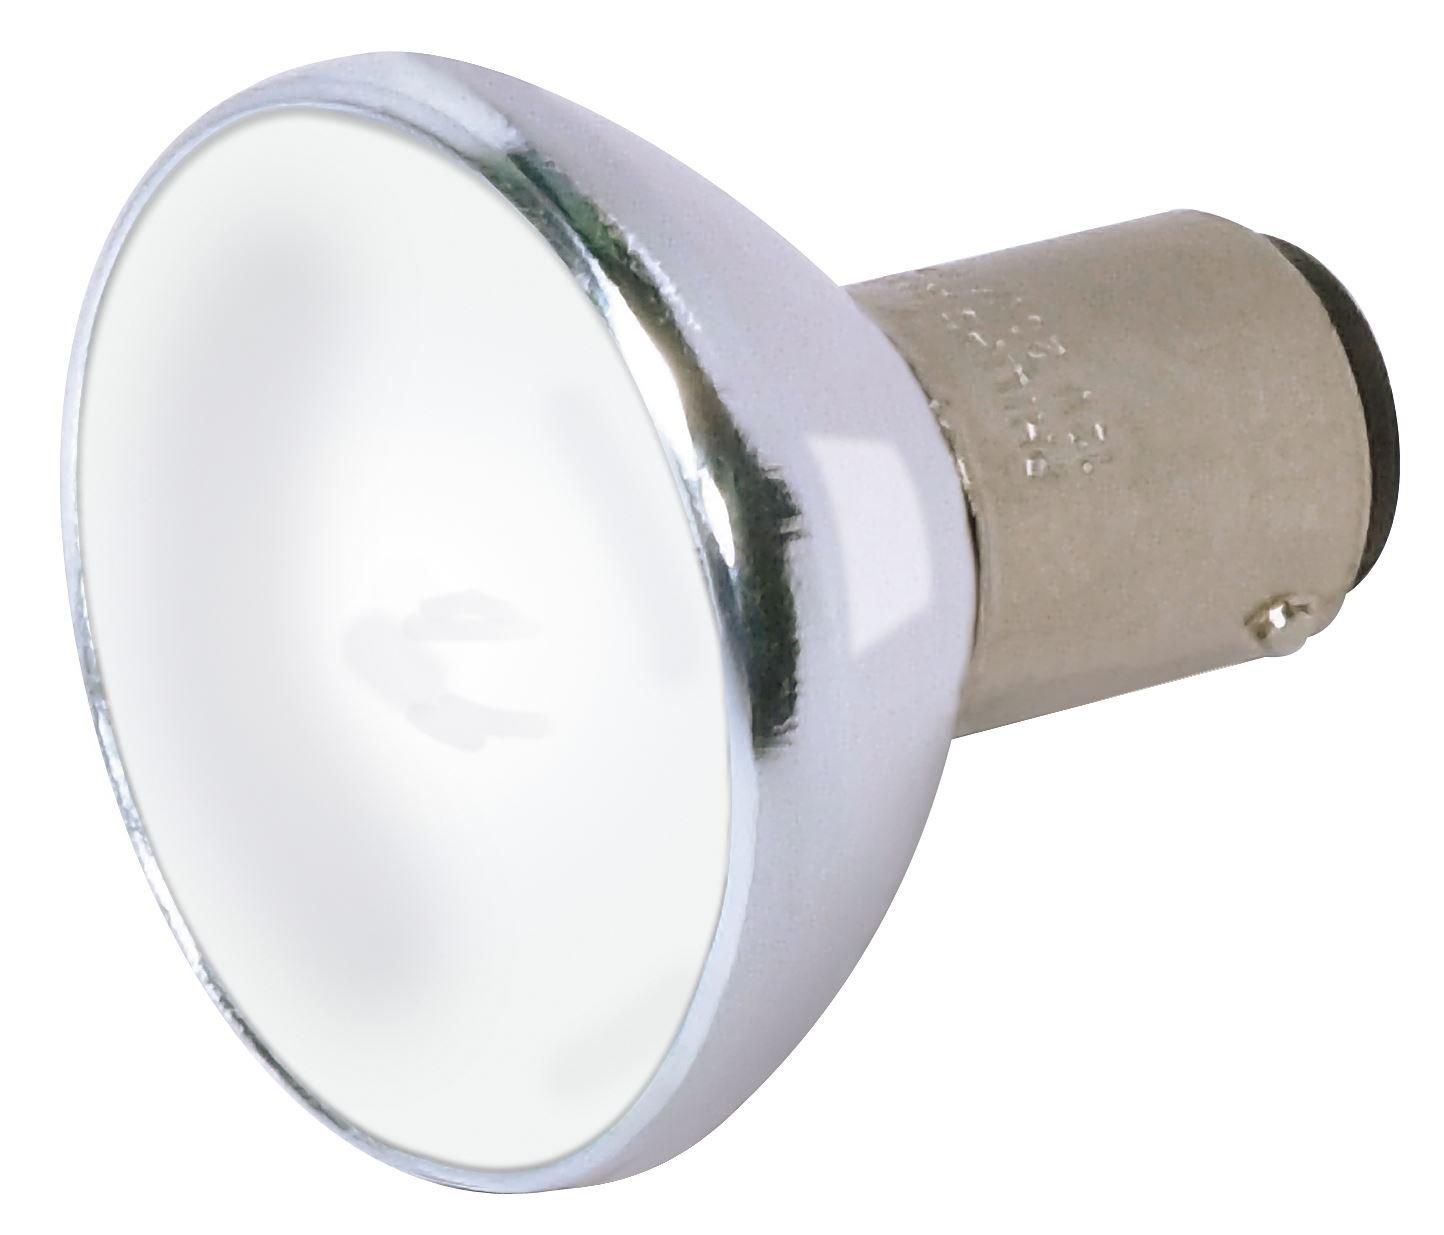 20ALR12/FL32 GBF Halogen ALR Aluminum Reflector, 20W BA15d ALR12, Frosted Bulb [Pack of 1]